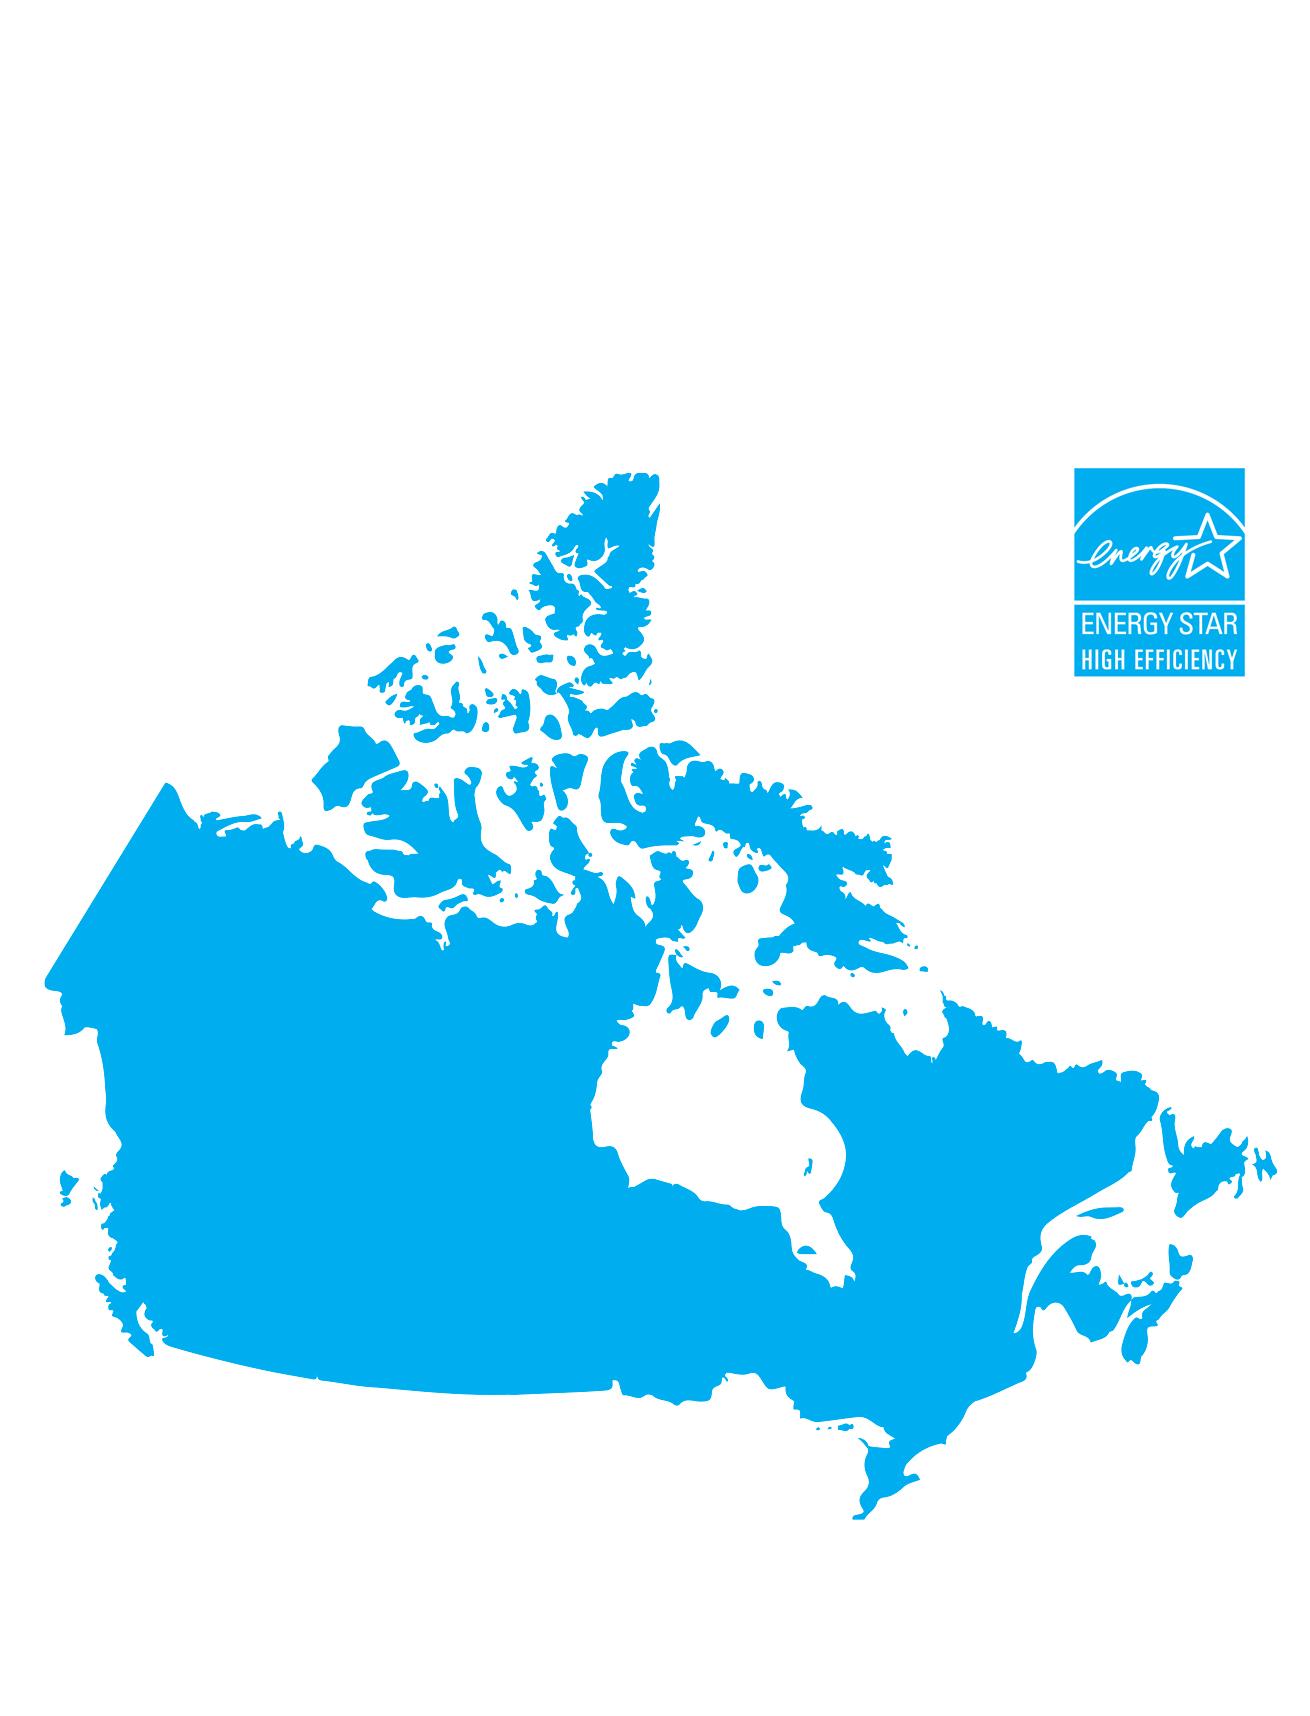 http://www.columbiaskylights.com/wp-content/uploads/Canada-Map-2020-Zone.jpg